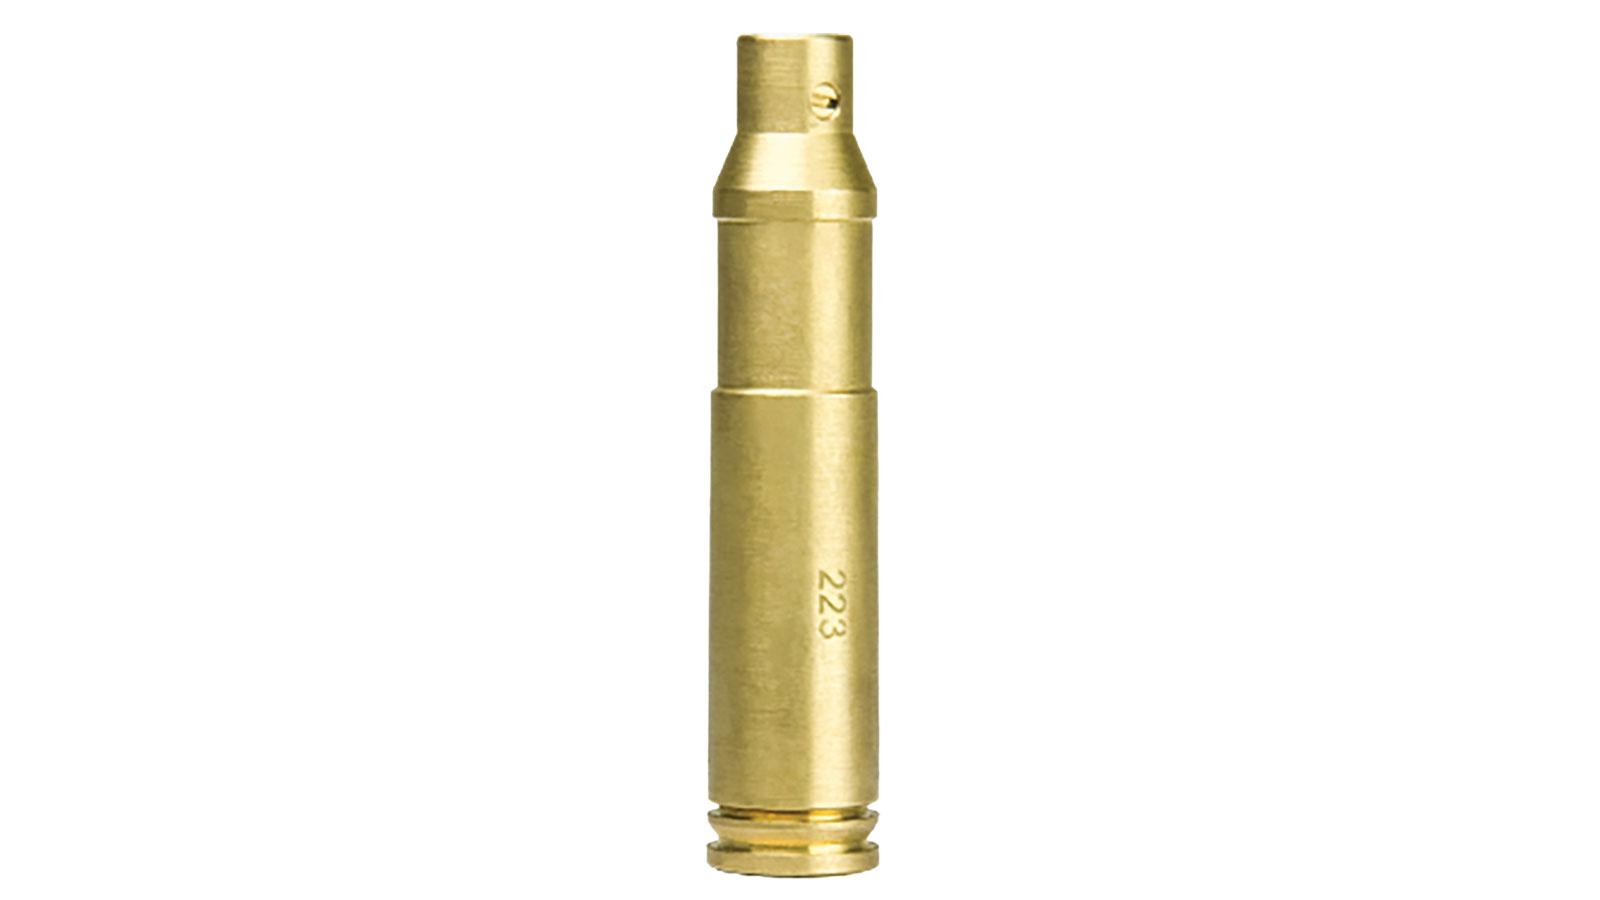 NCStar Cartridge Red Laser BoreSite